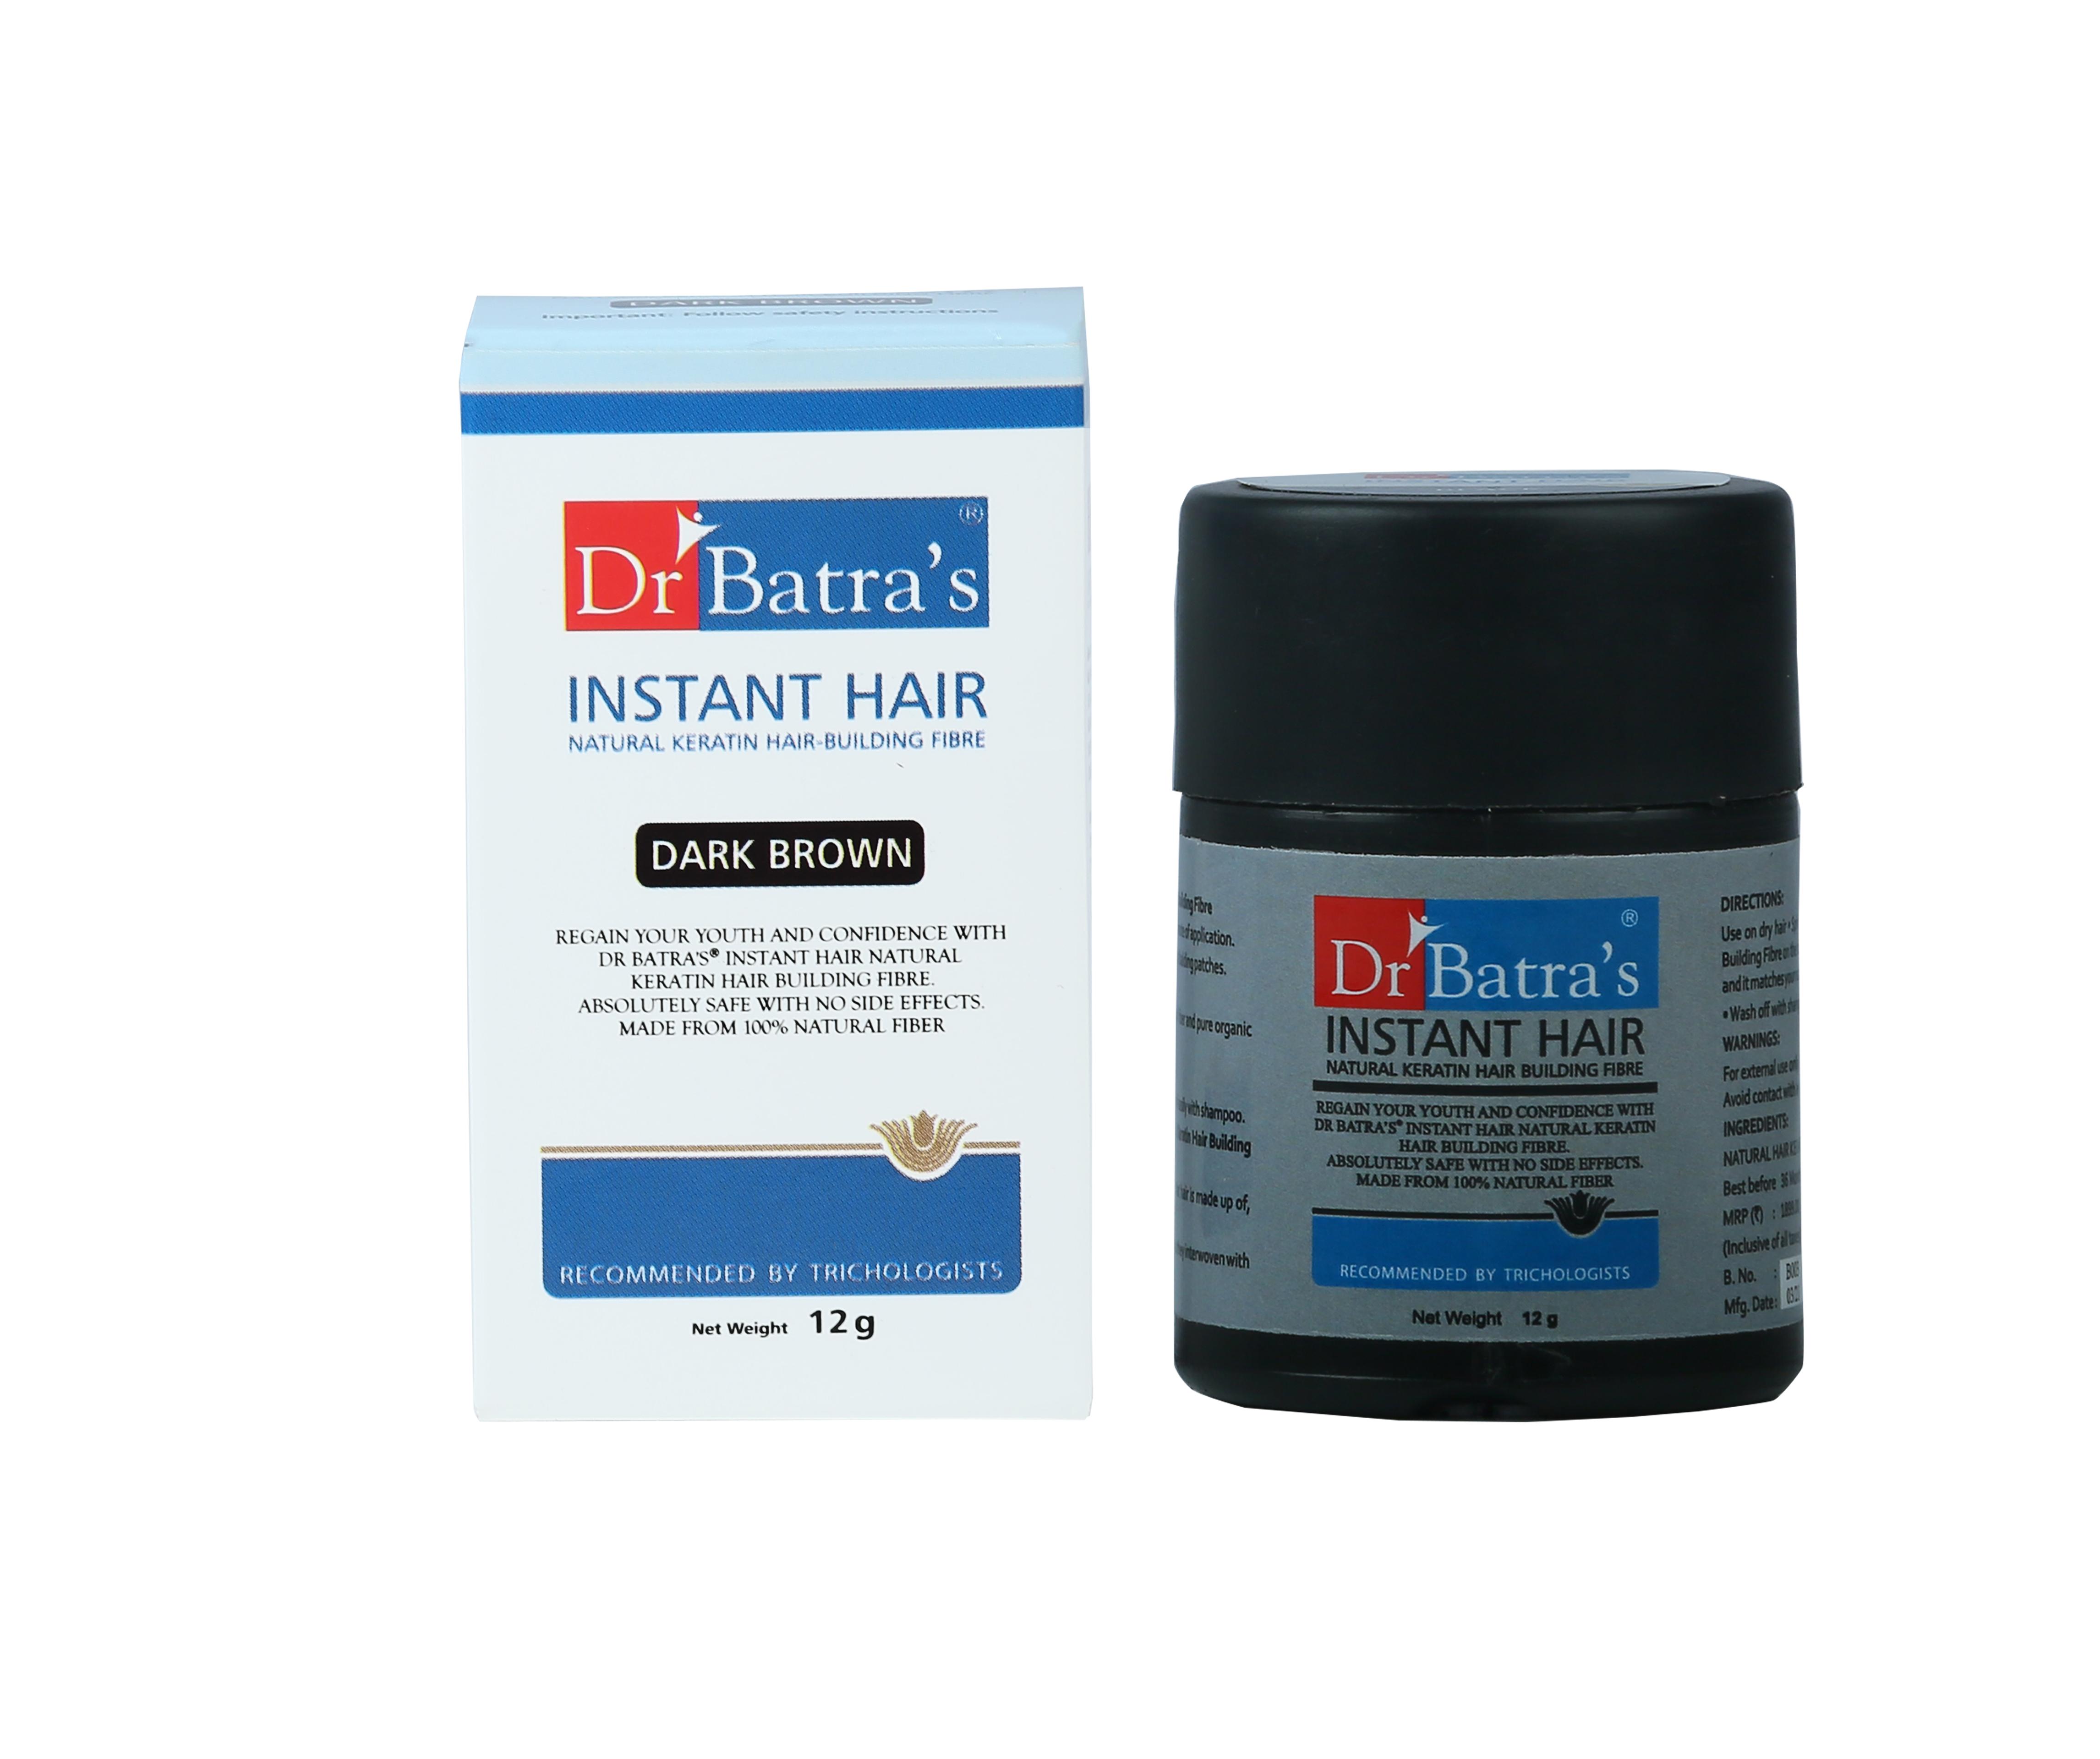 Dr Batra's | Dr Batra's Instant Hair Natural keratin Hair Building Fibre Dark Brown - 12 gm